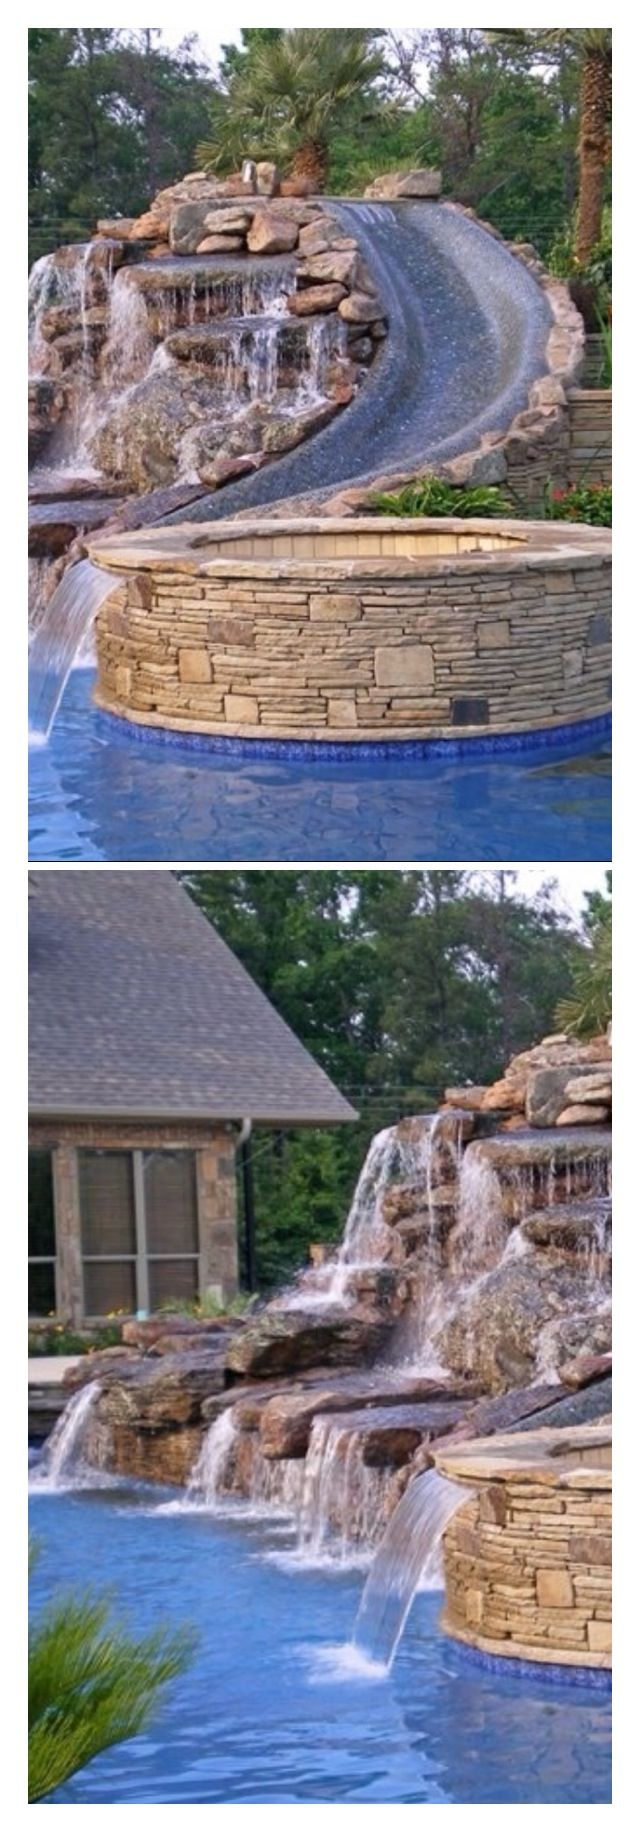 Luxury Homes - Pools - Houzz.com tp